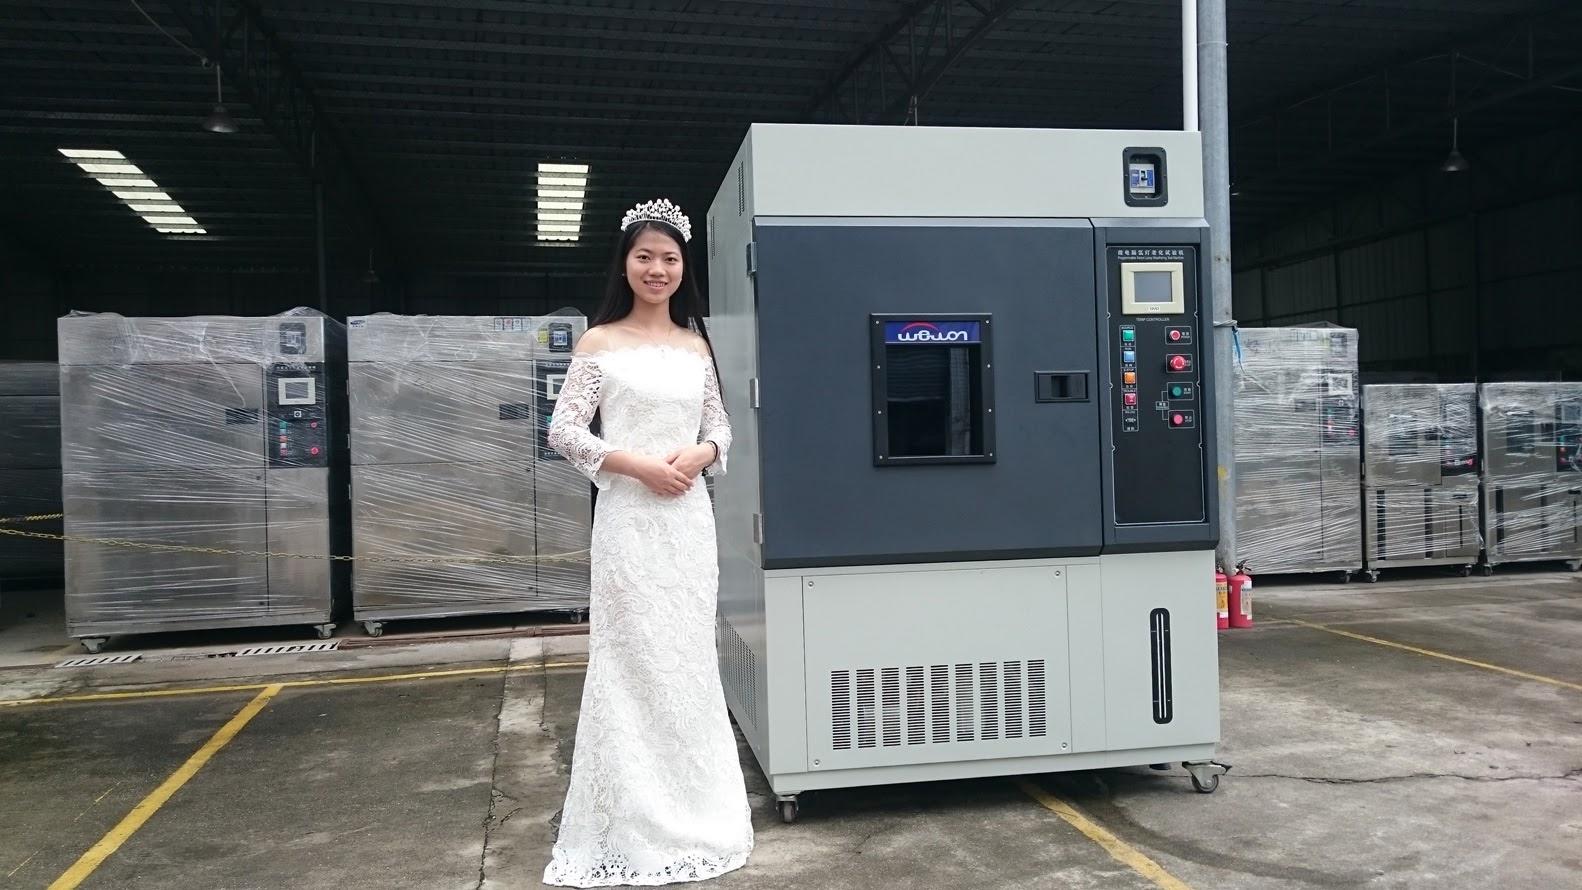 MIL STD 810H Test Method 505.7 – Solar Radiation Sunshine Machine